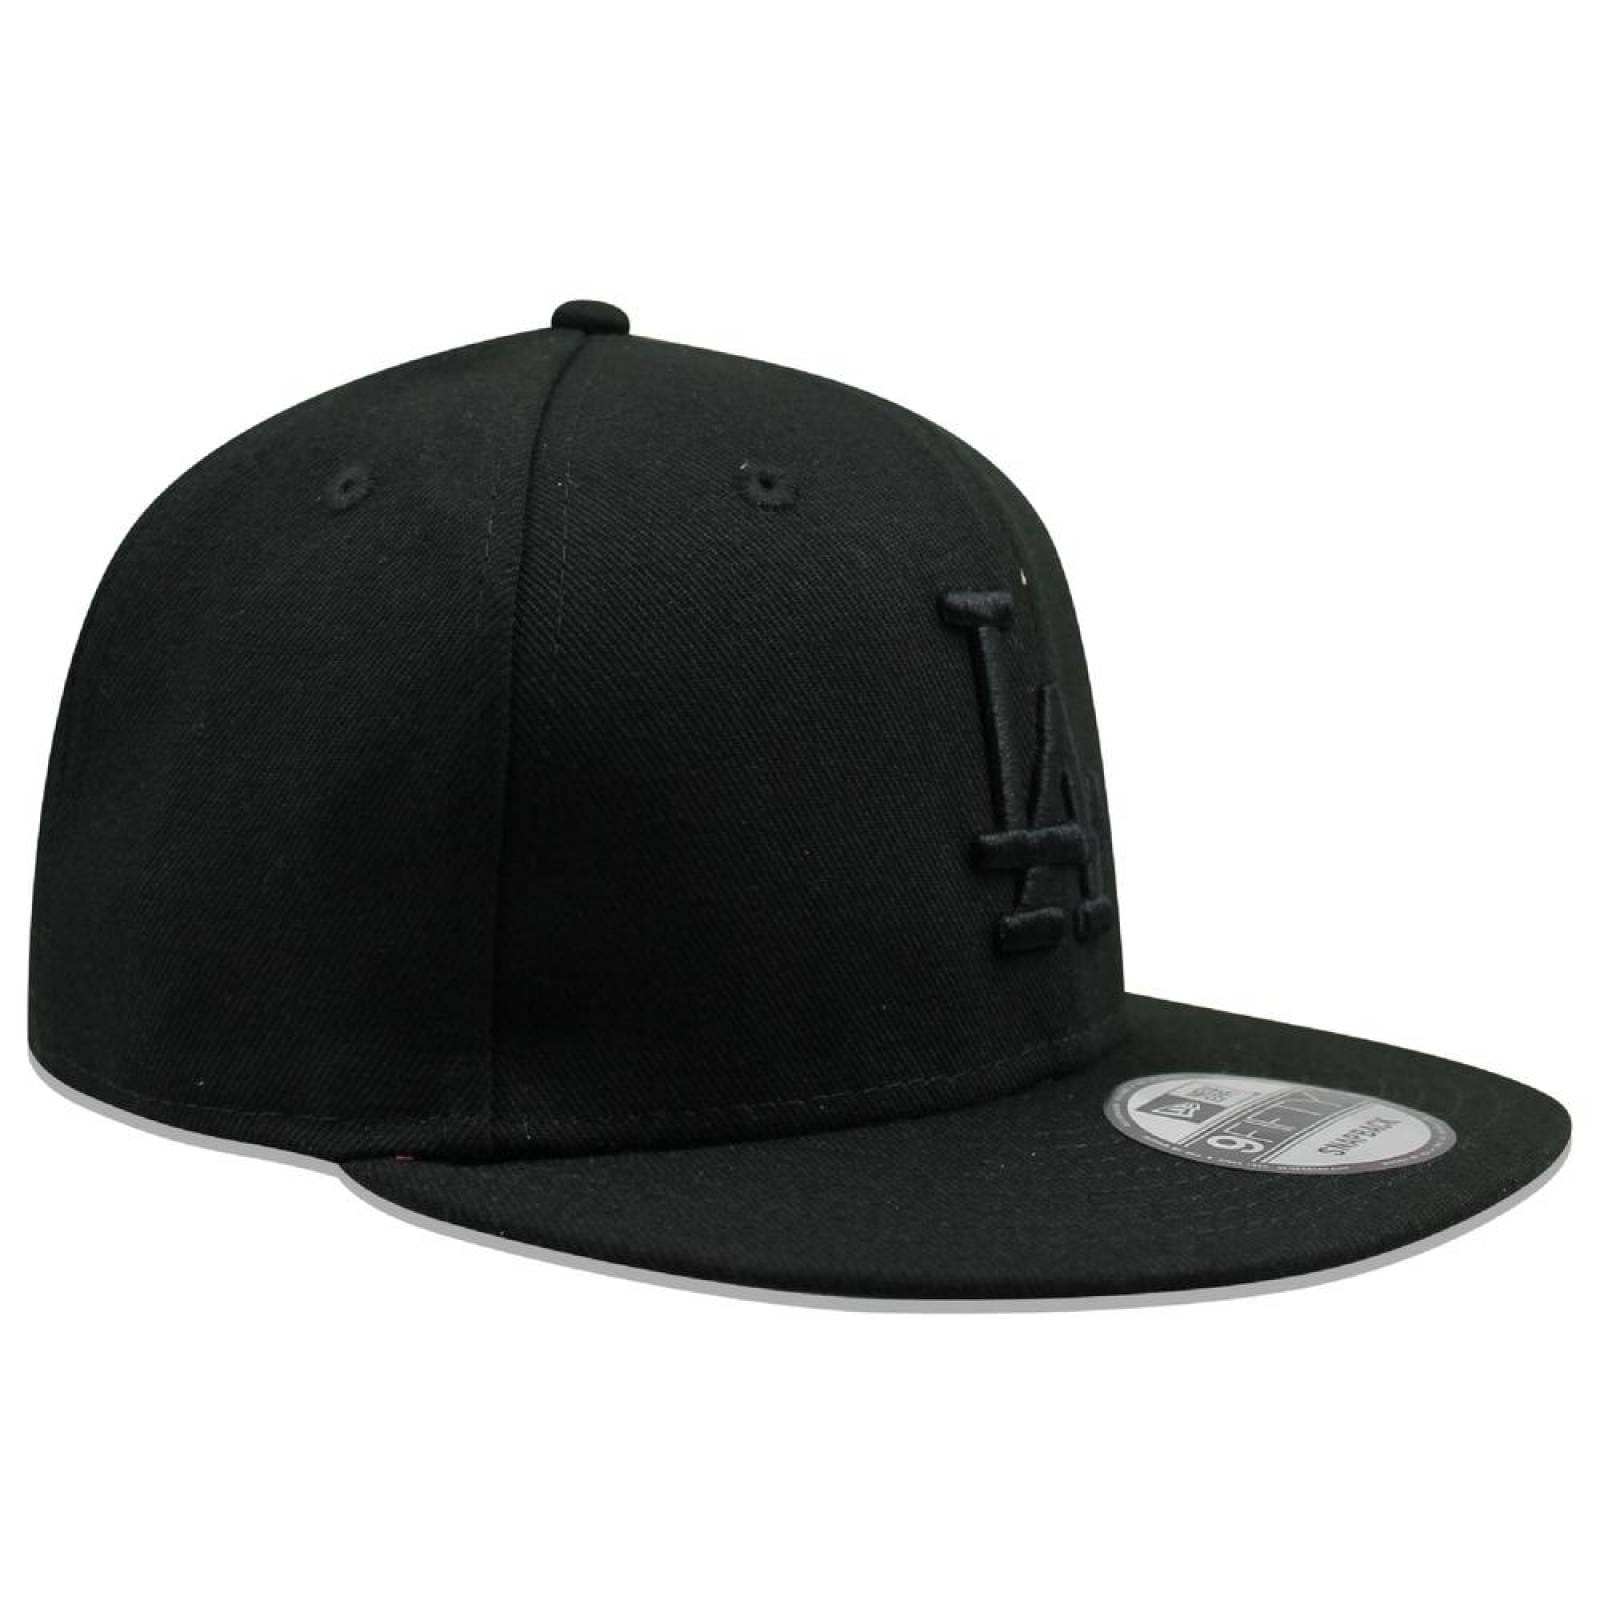 Gorra New Era 9 Fifty MLB Dodgers Basic Snap Black On Black